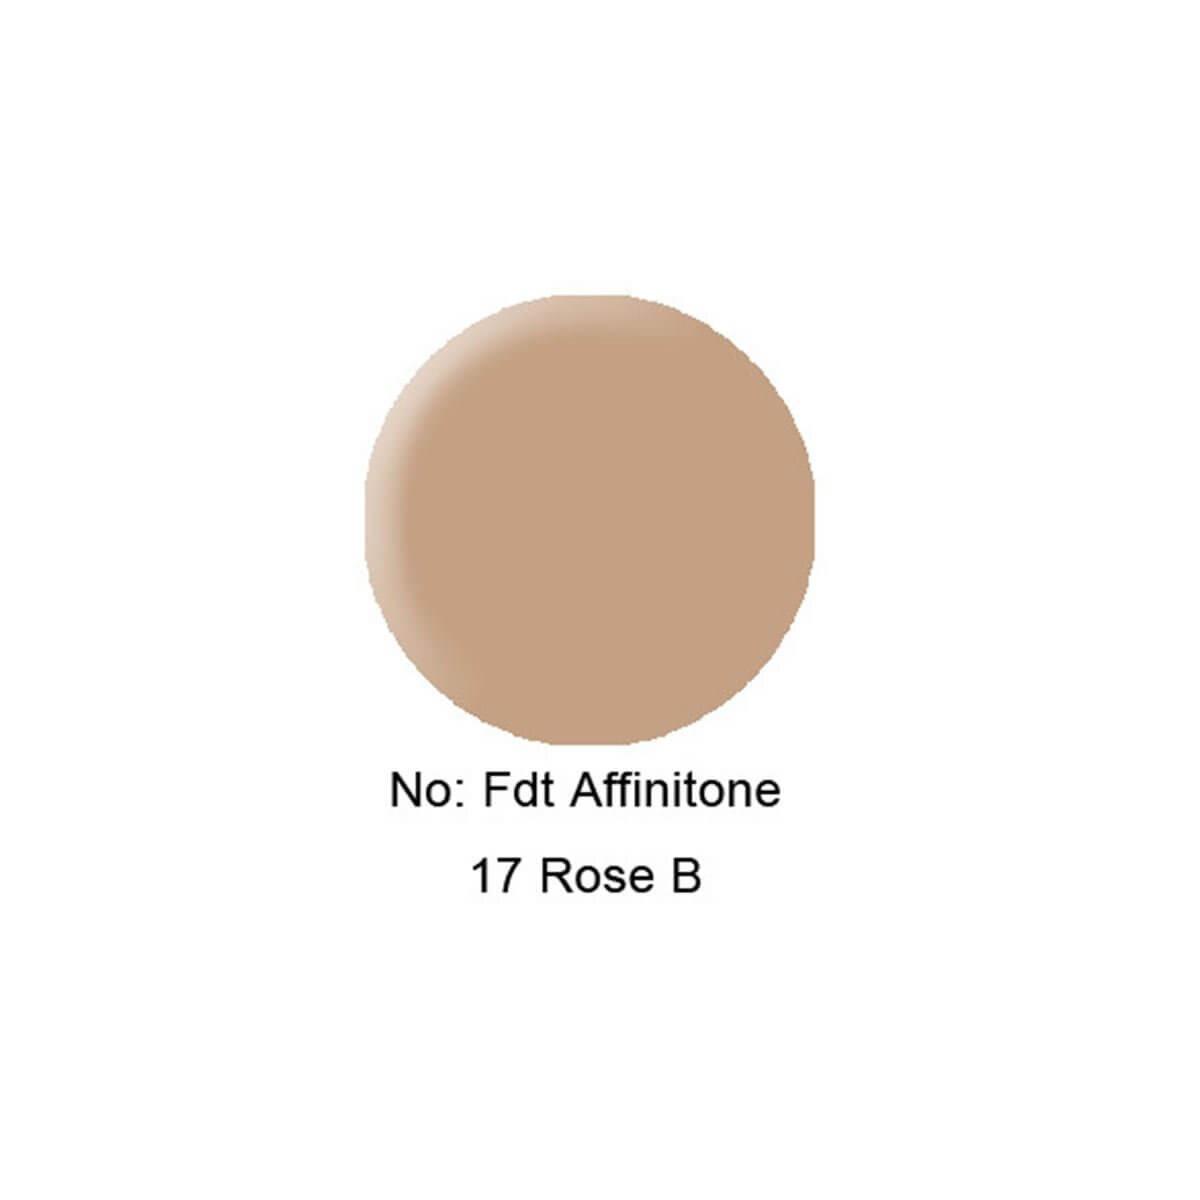 Affinitone Fondöten 17 Rose Bej